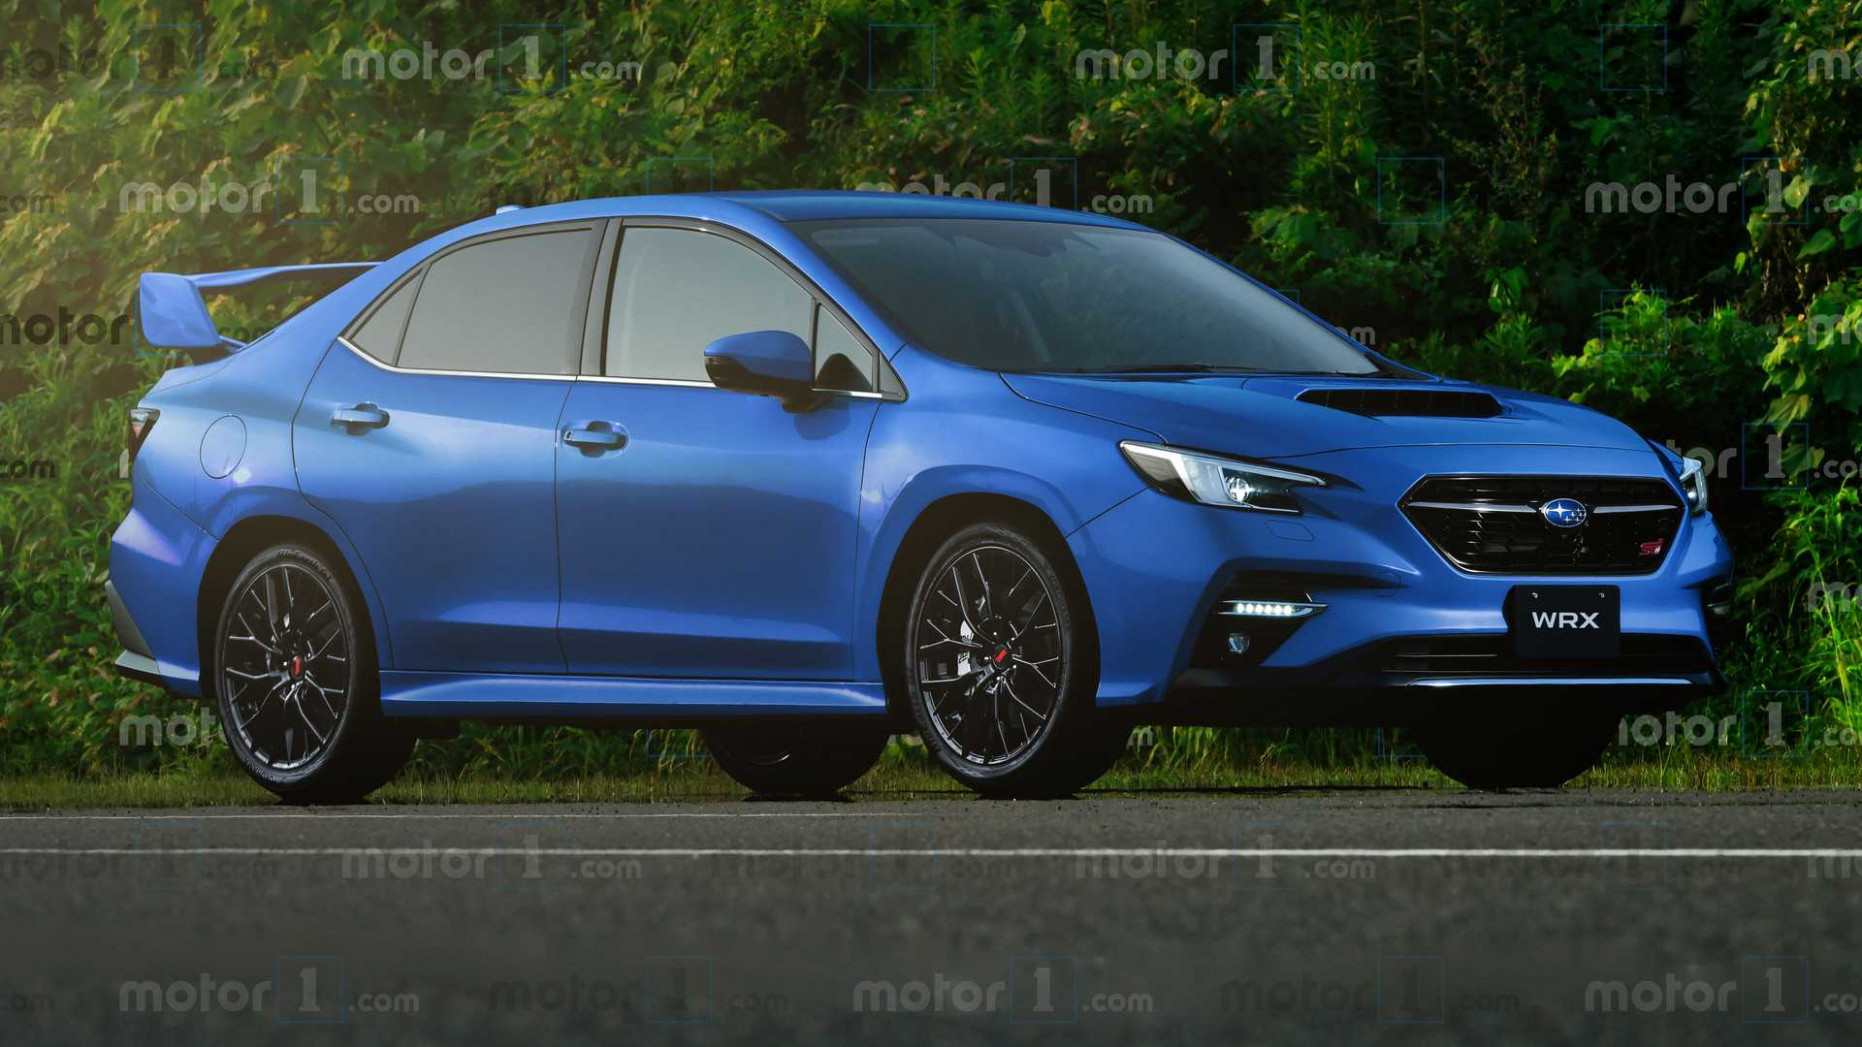 Wallpaper Subaru Wrx Hatchback 2022